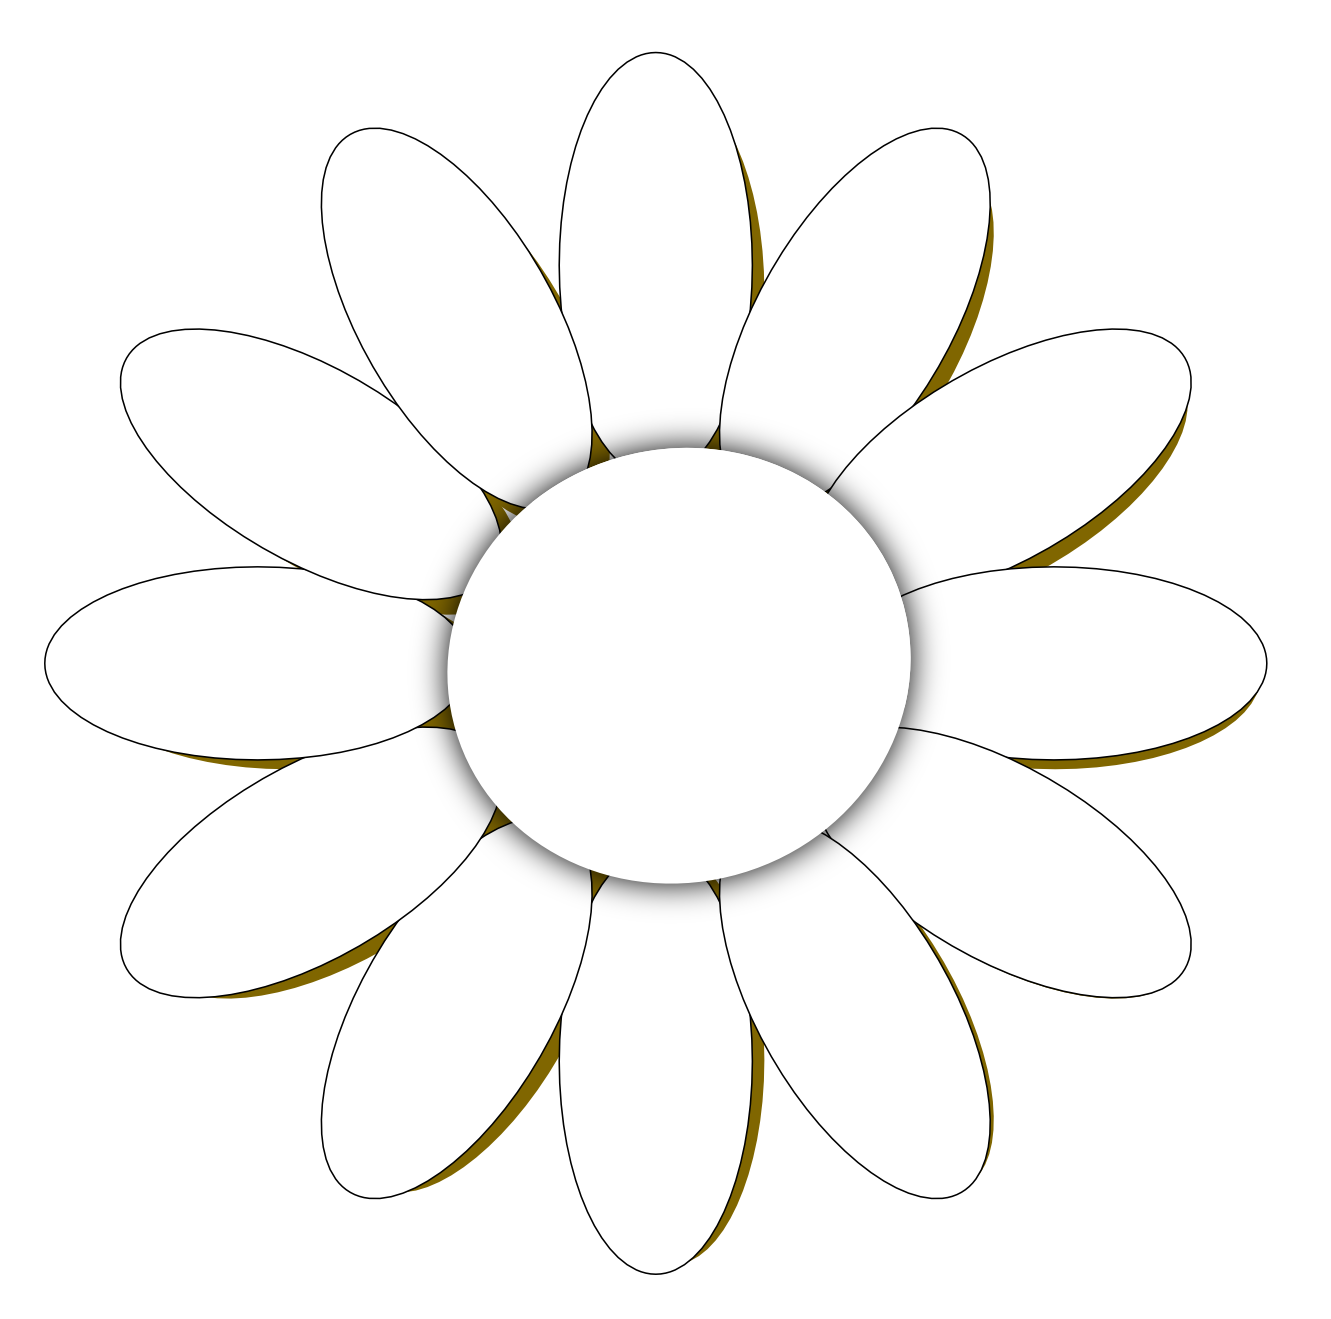 Daisies clipart black and white. Daisy flower clip art